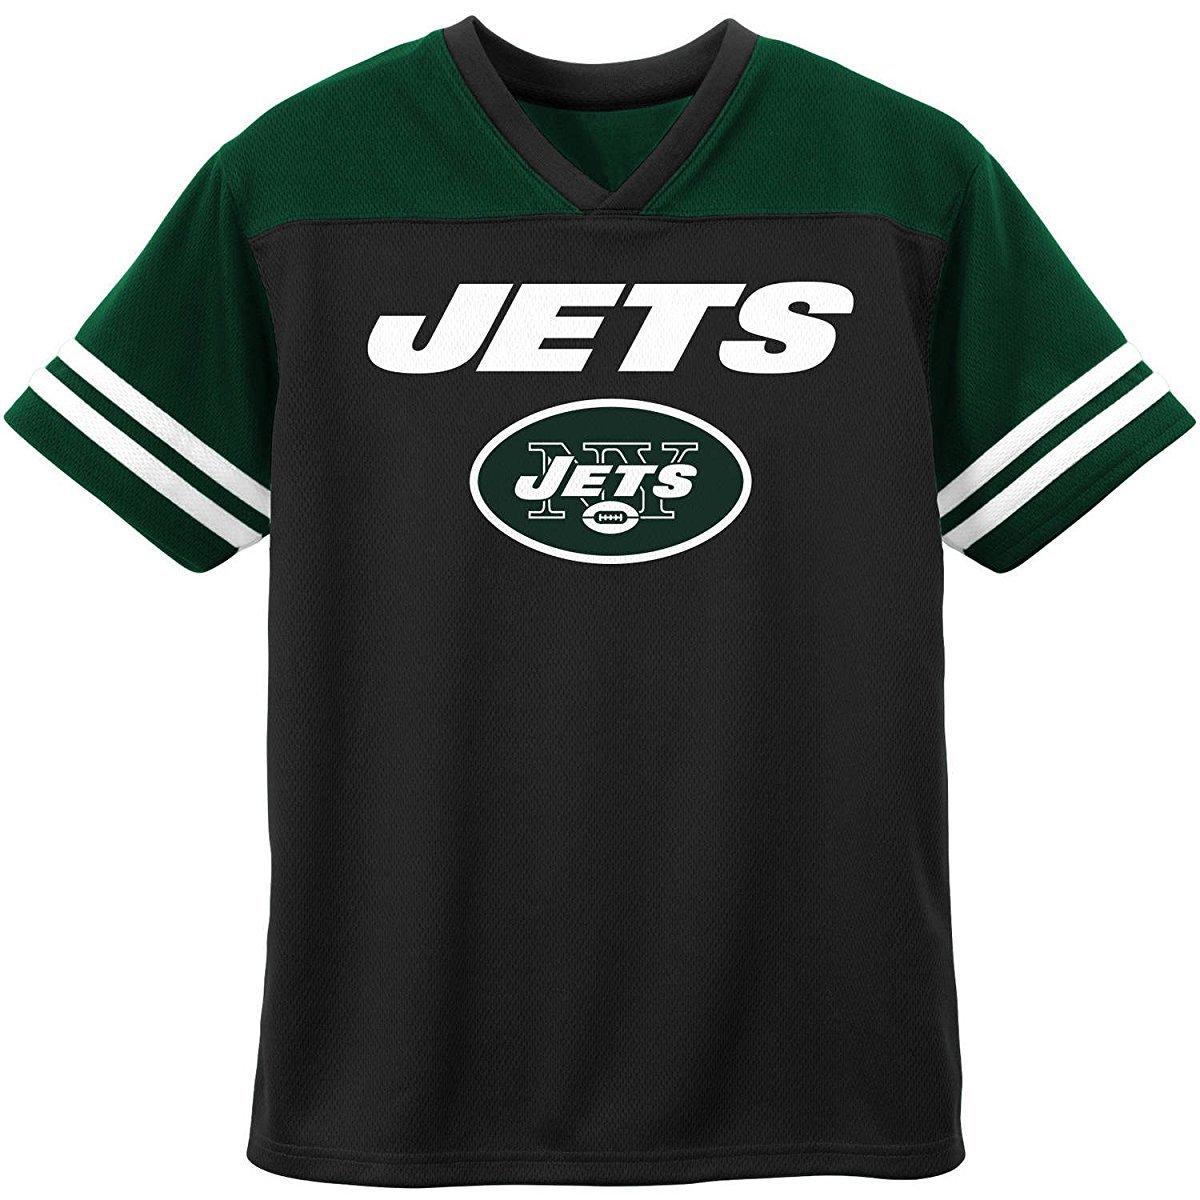 dd2e5607d5c Amazon.com  New York Jets Black Green NFL Boys Youth Team Apparel V Neck  Jersey  Clothing